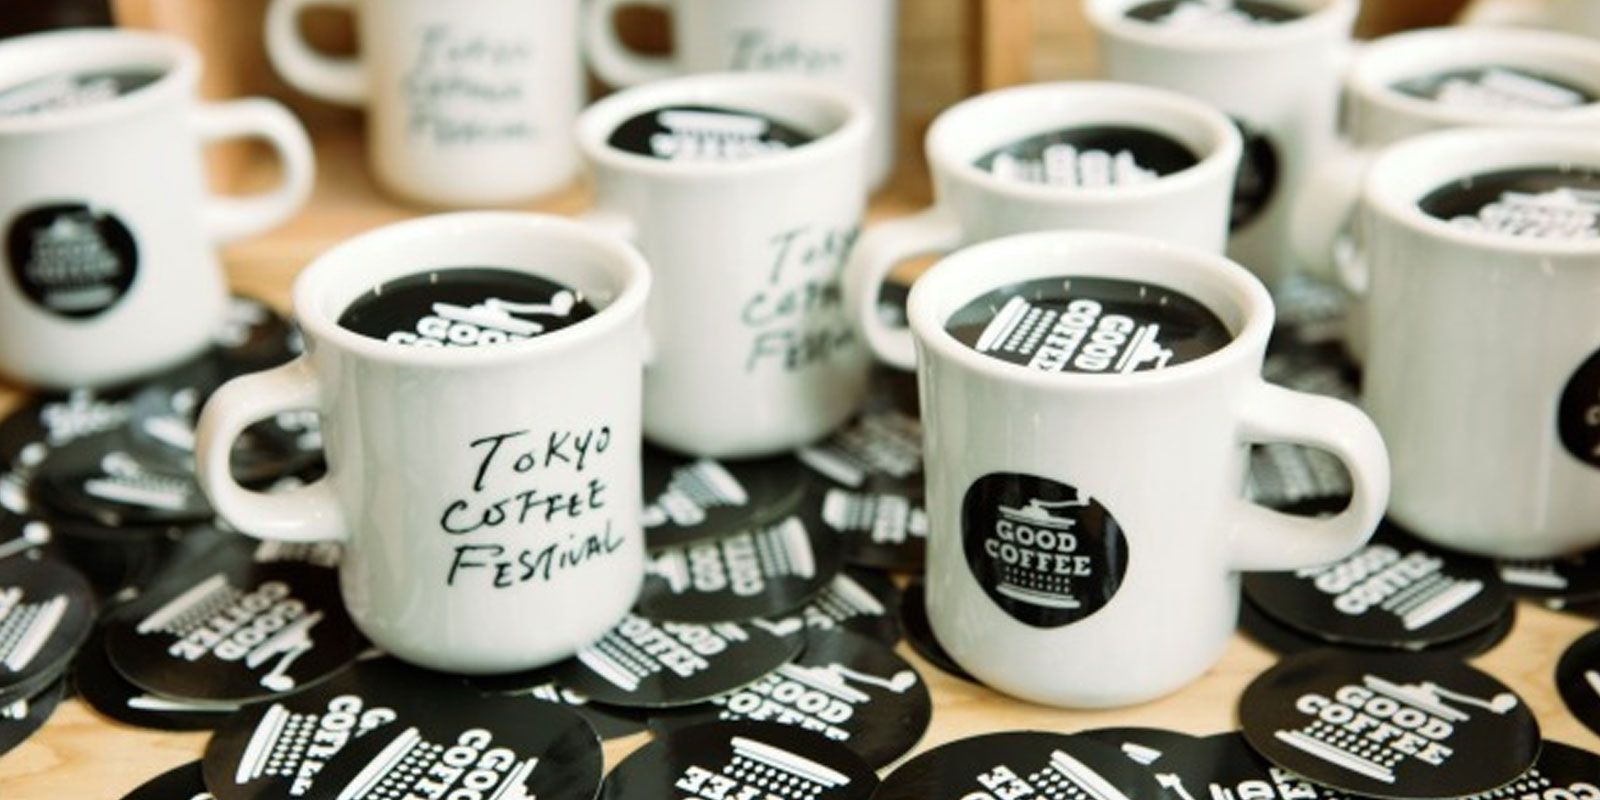 Tokyo Coffee Festival 2019 Spring